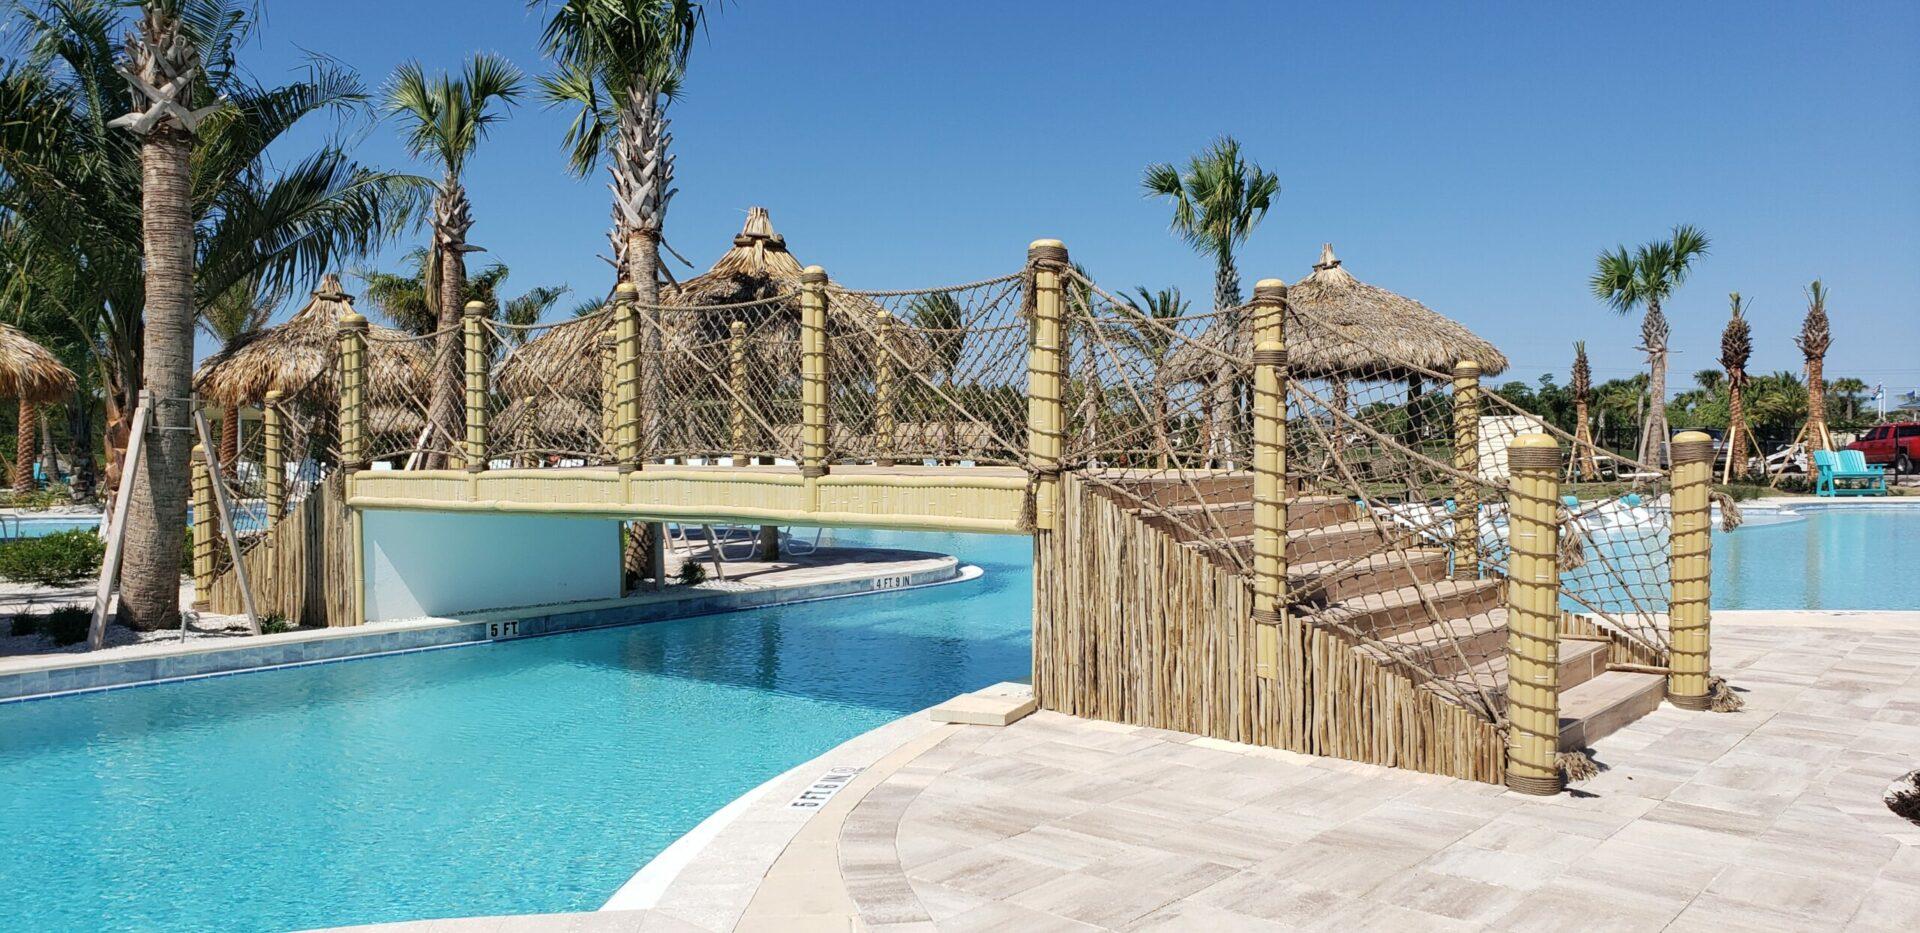 Amenities pool Margaritaville, Daytona FL